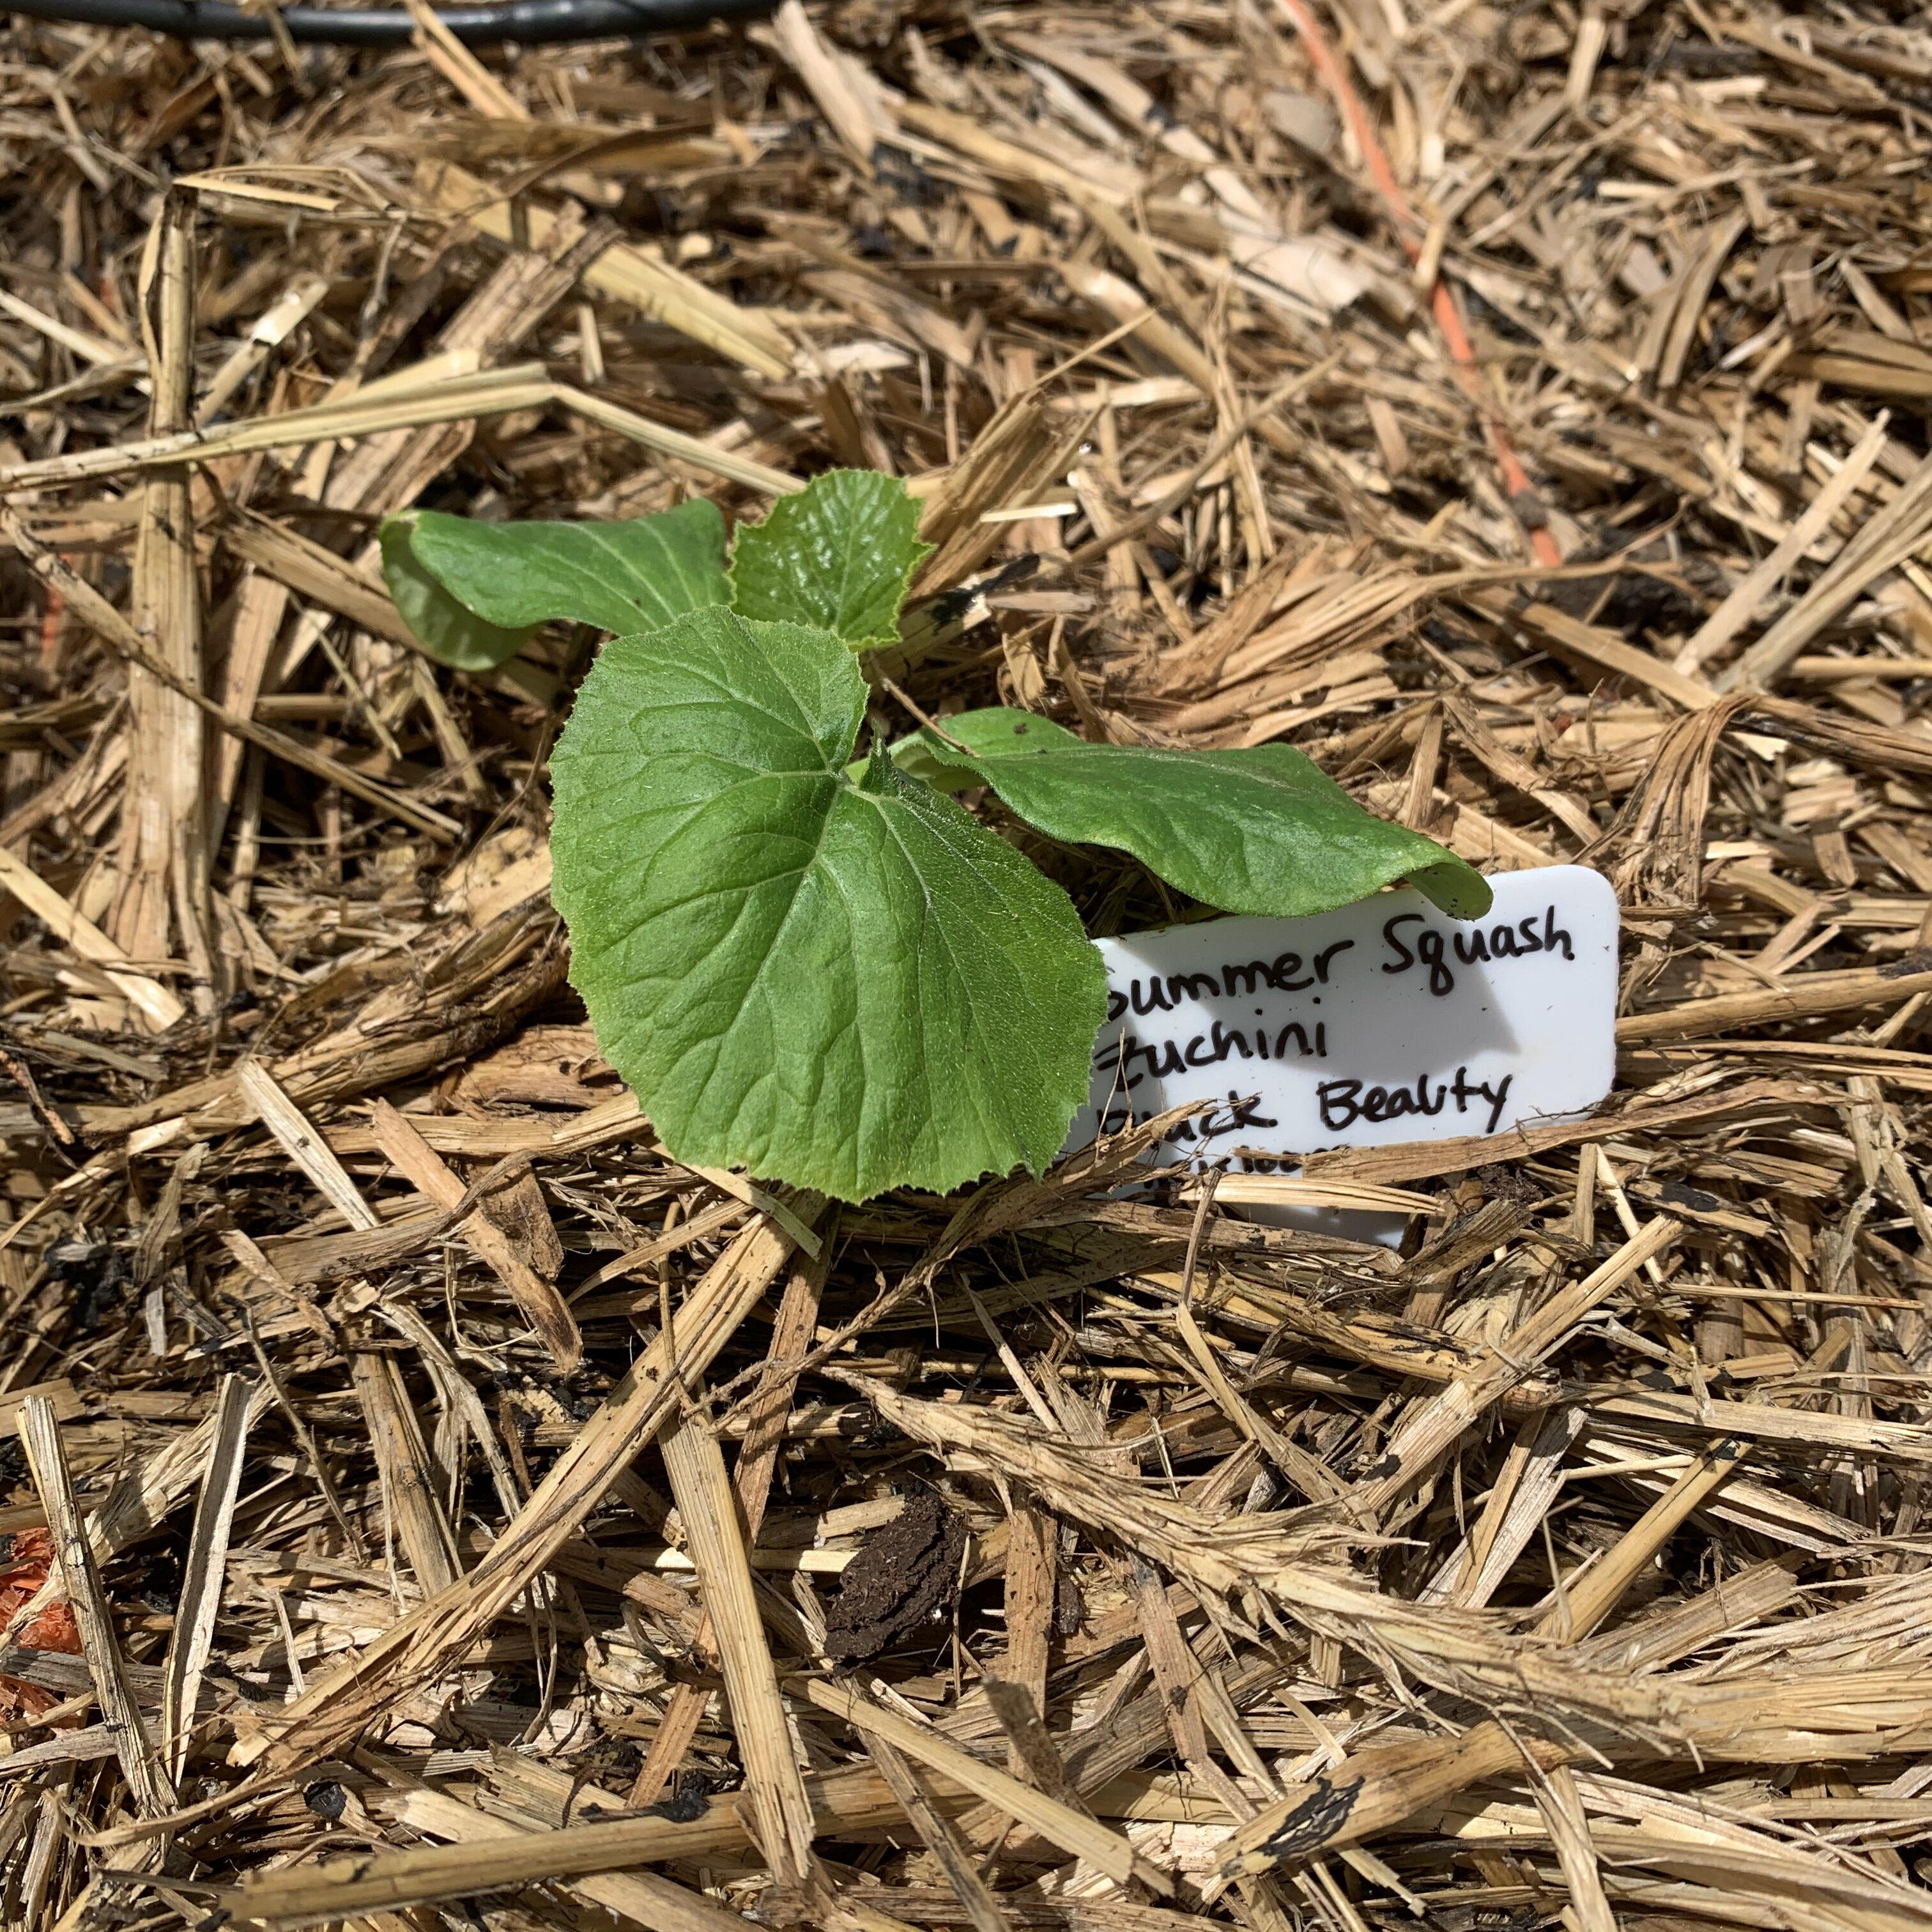 BAC1431A 0844 465A BA70 6BBCCBC3870A Cucumbers planted!